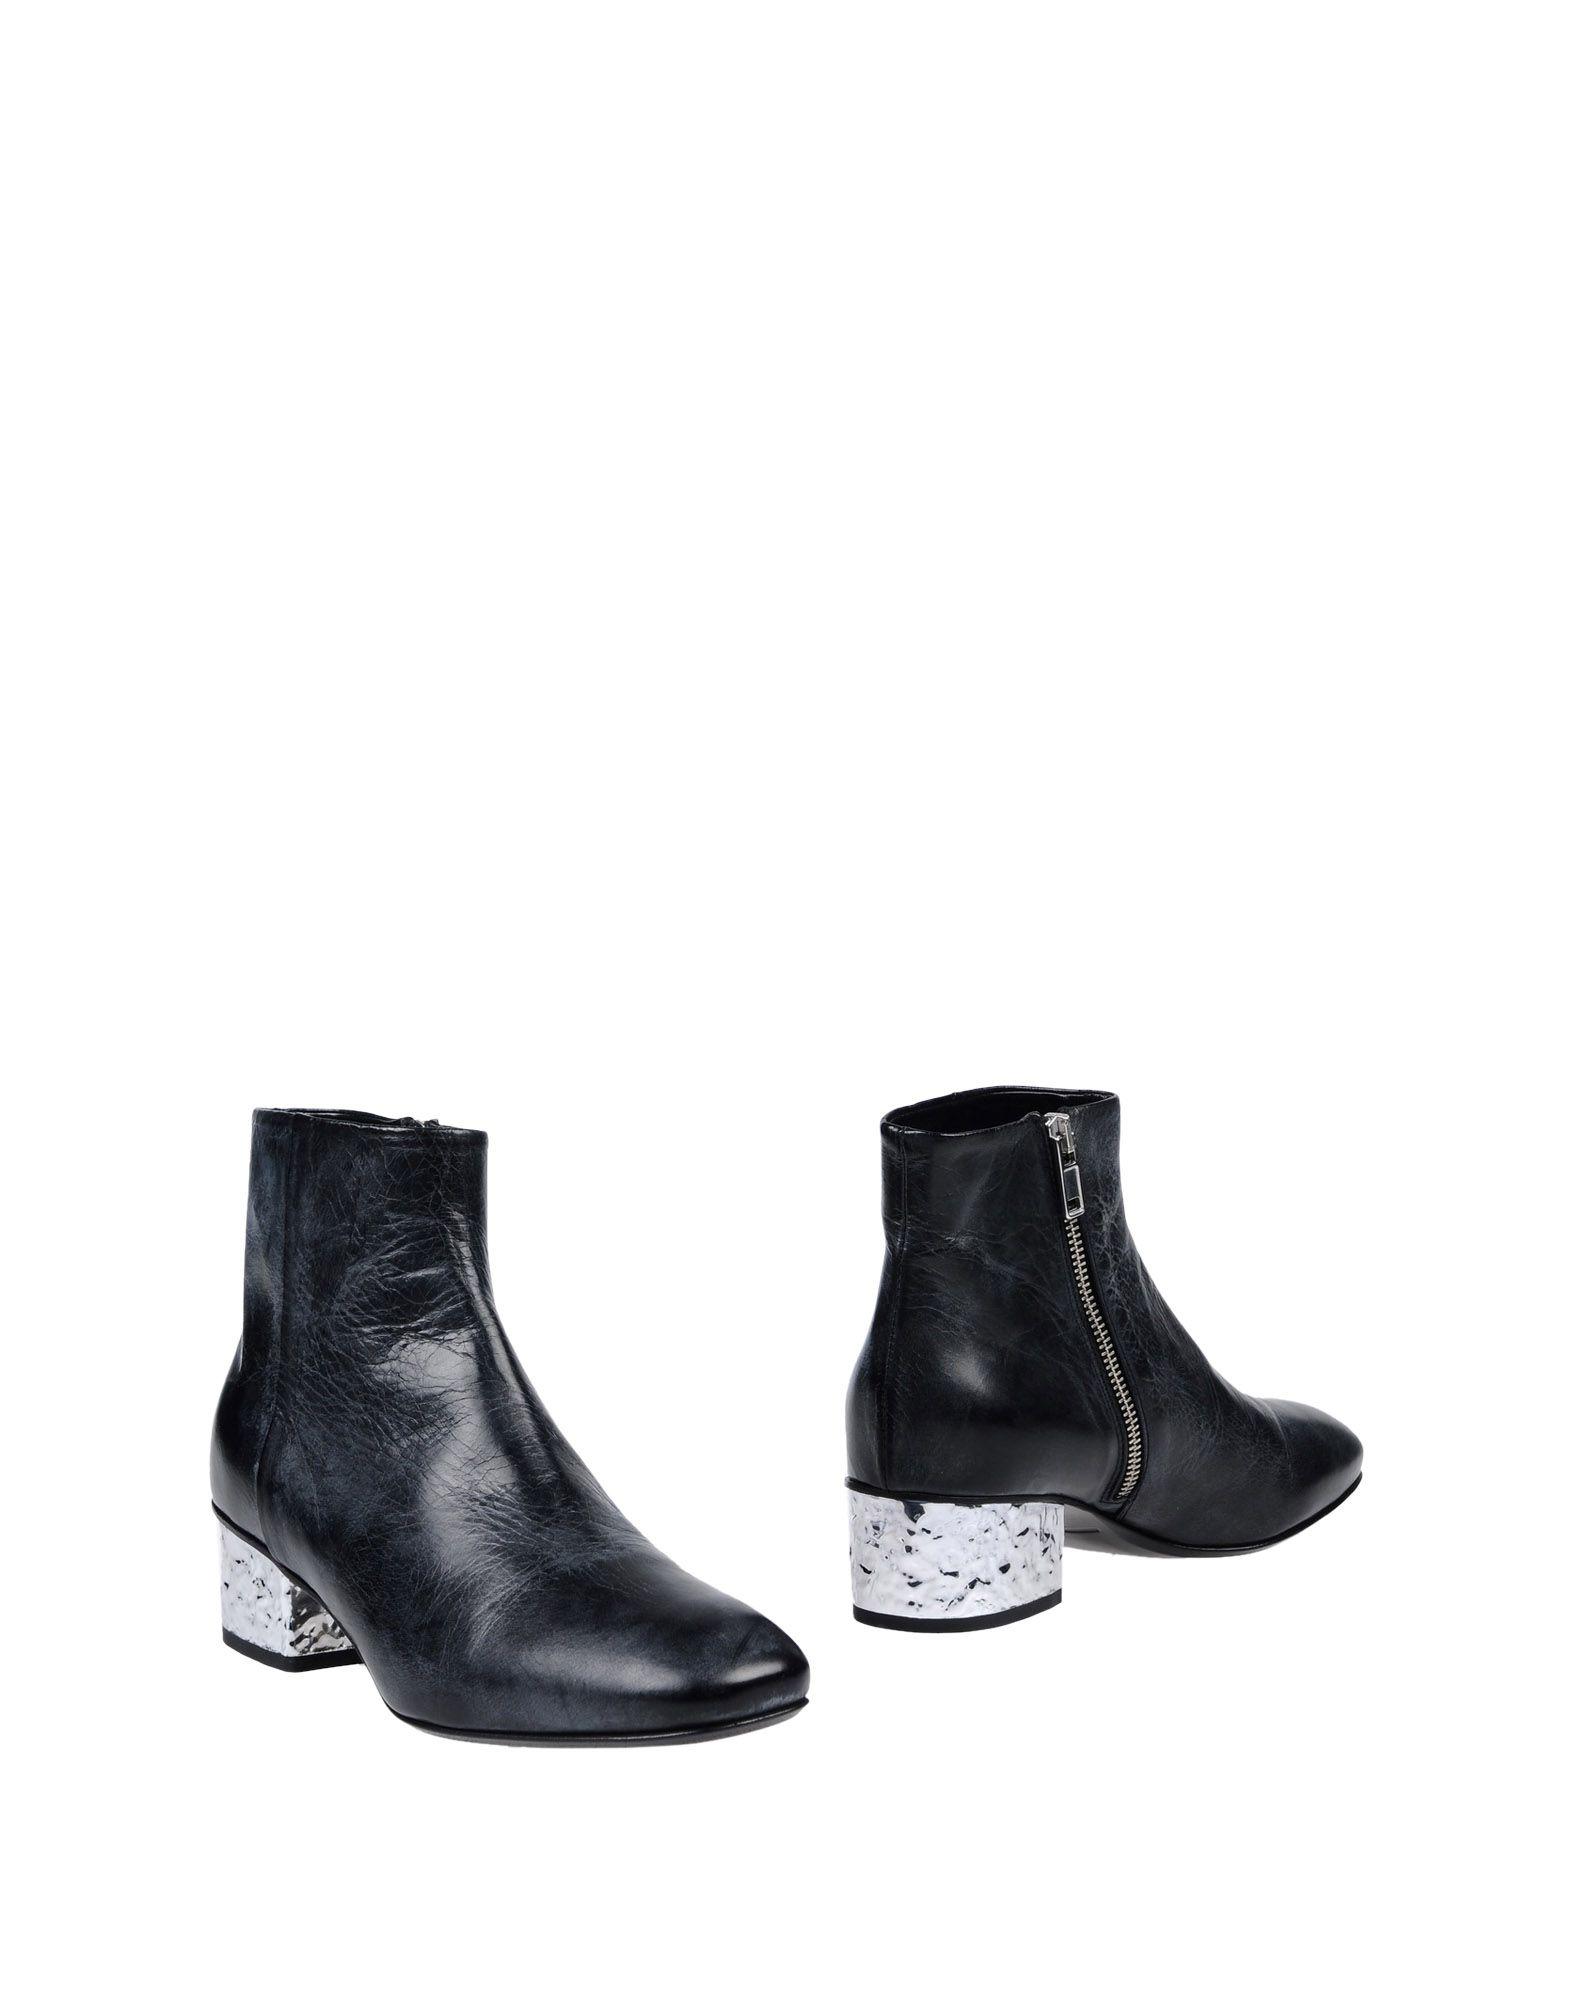 Mcq Alexander Women Mcqueen Ankle Boot - Women Alexander Mcq Alexander Mcqueen Ankle Boots online on  Australia - 11413307AJ adc4fa